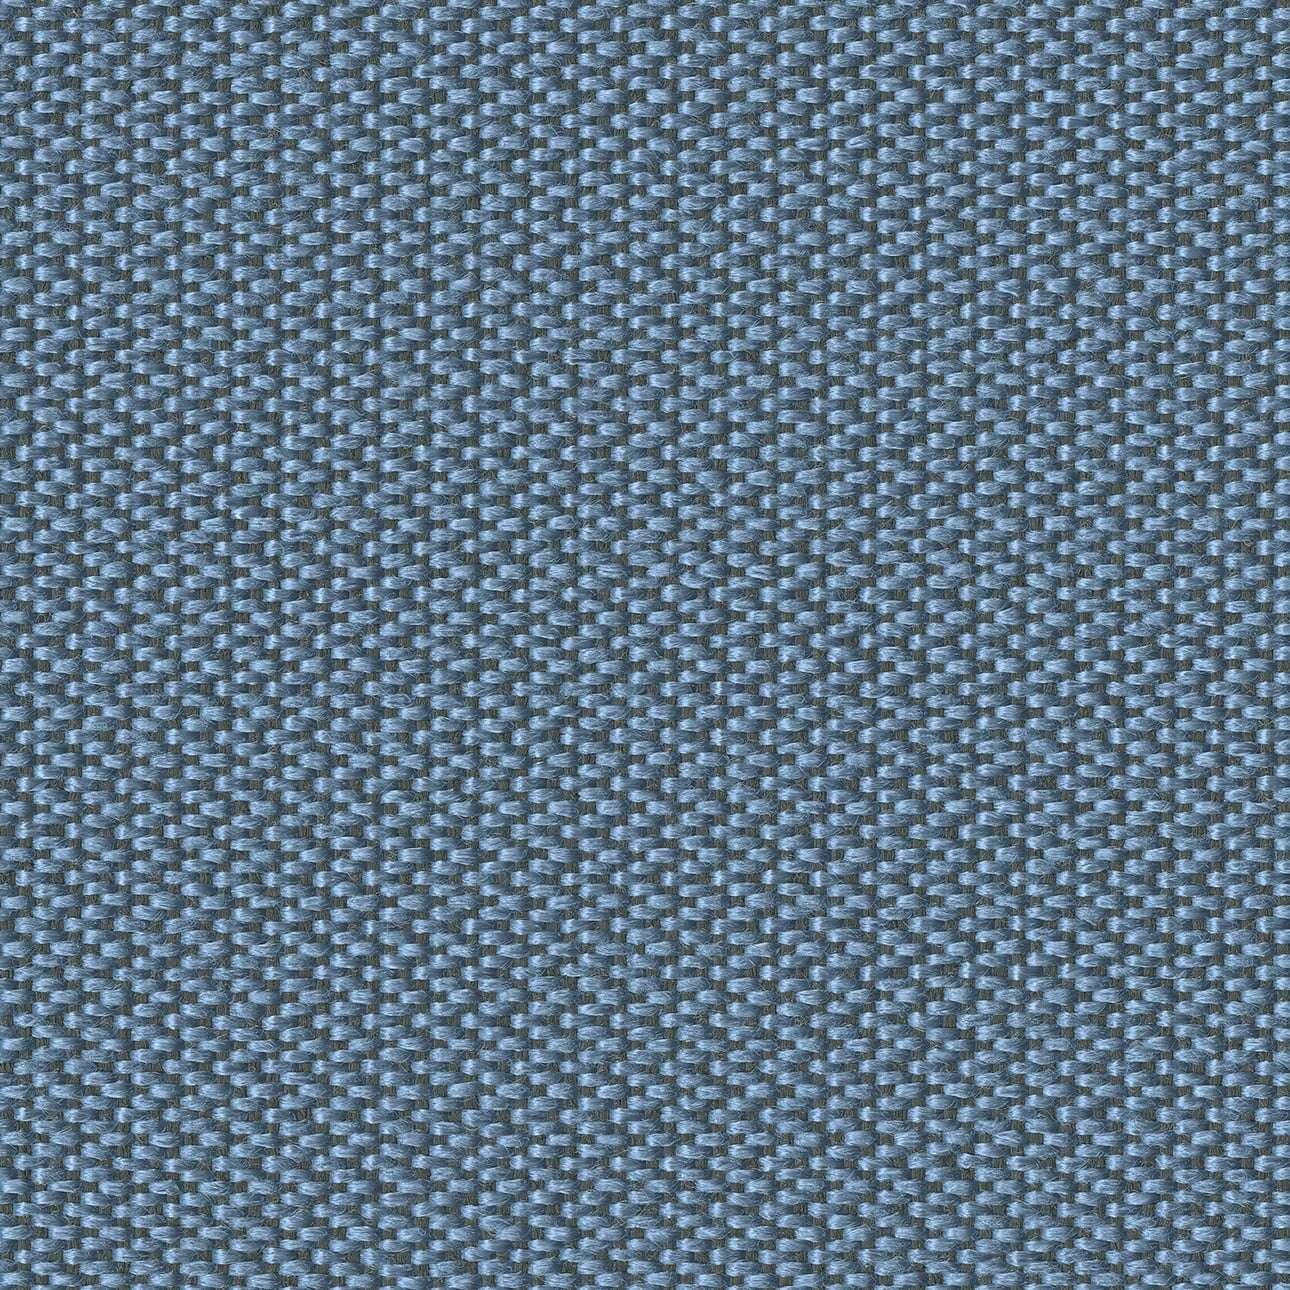 Pokrowiec na fotel Ikea PS w kolekcji Bergen, tkanina: 161-79